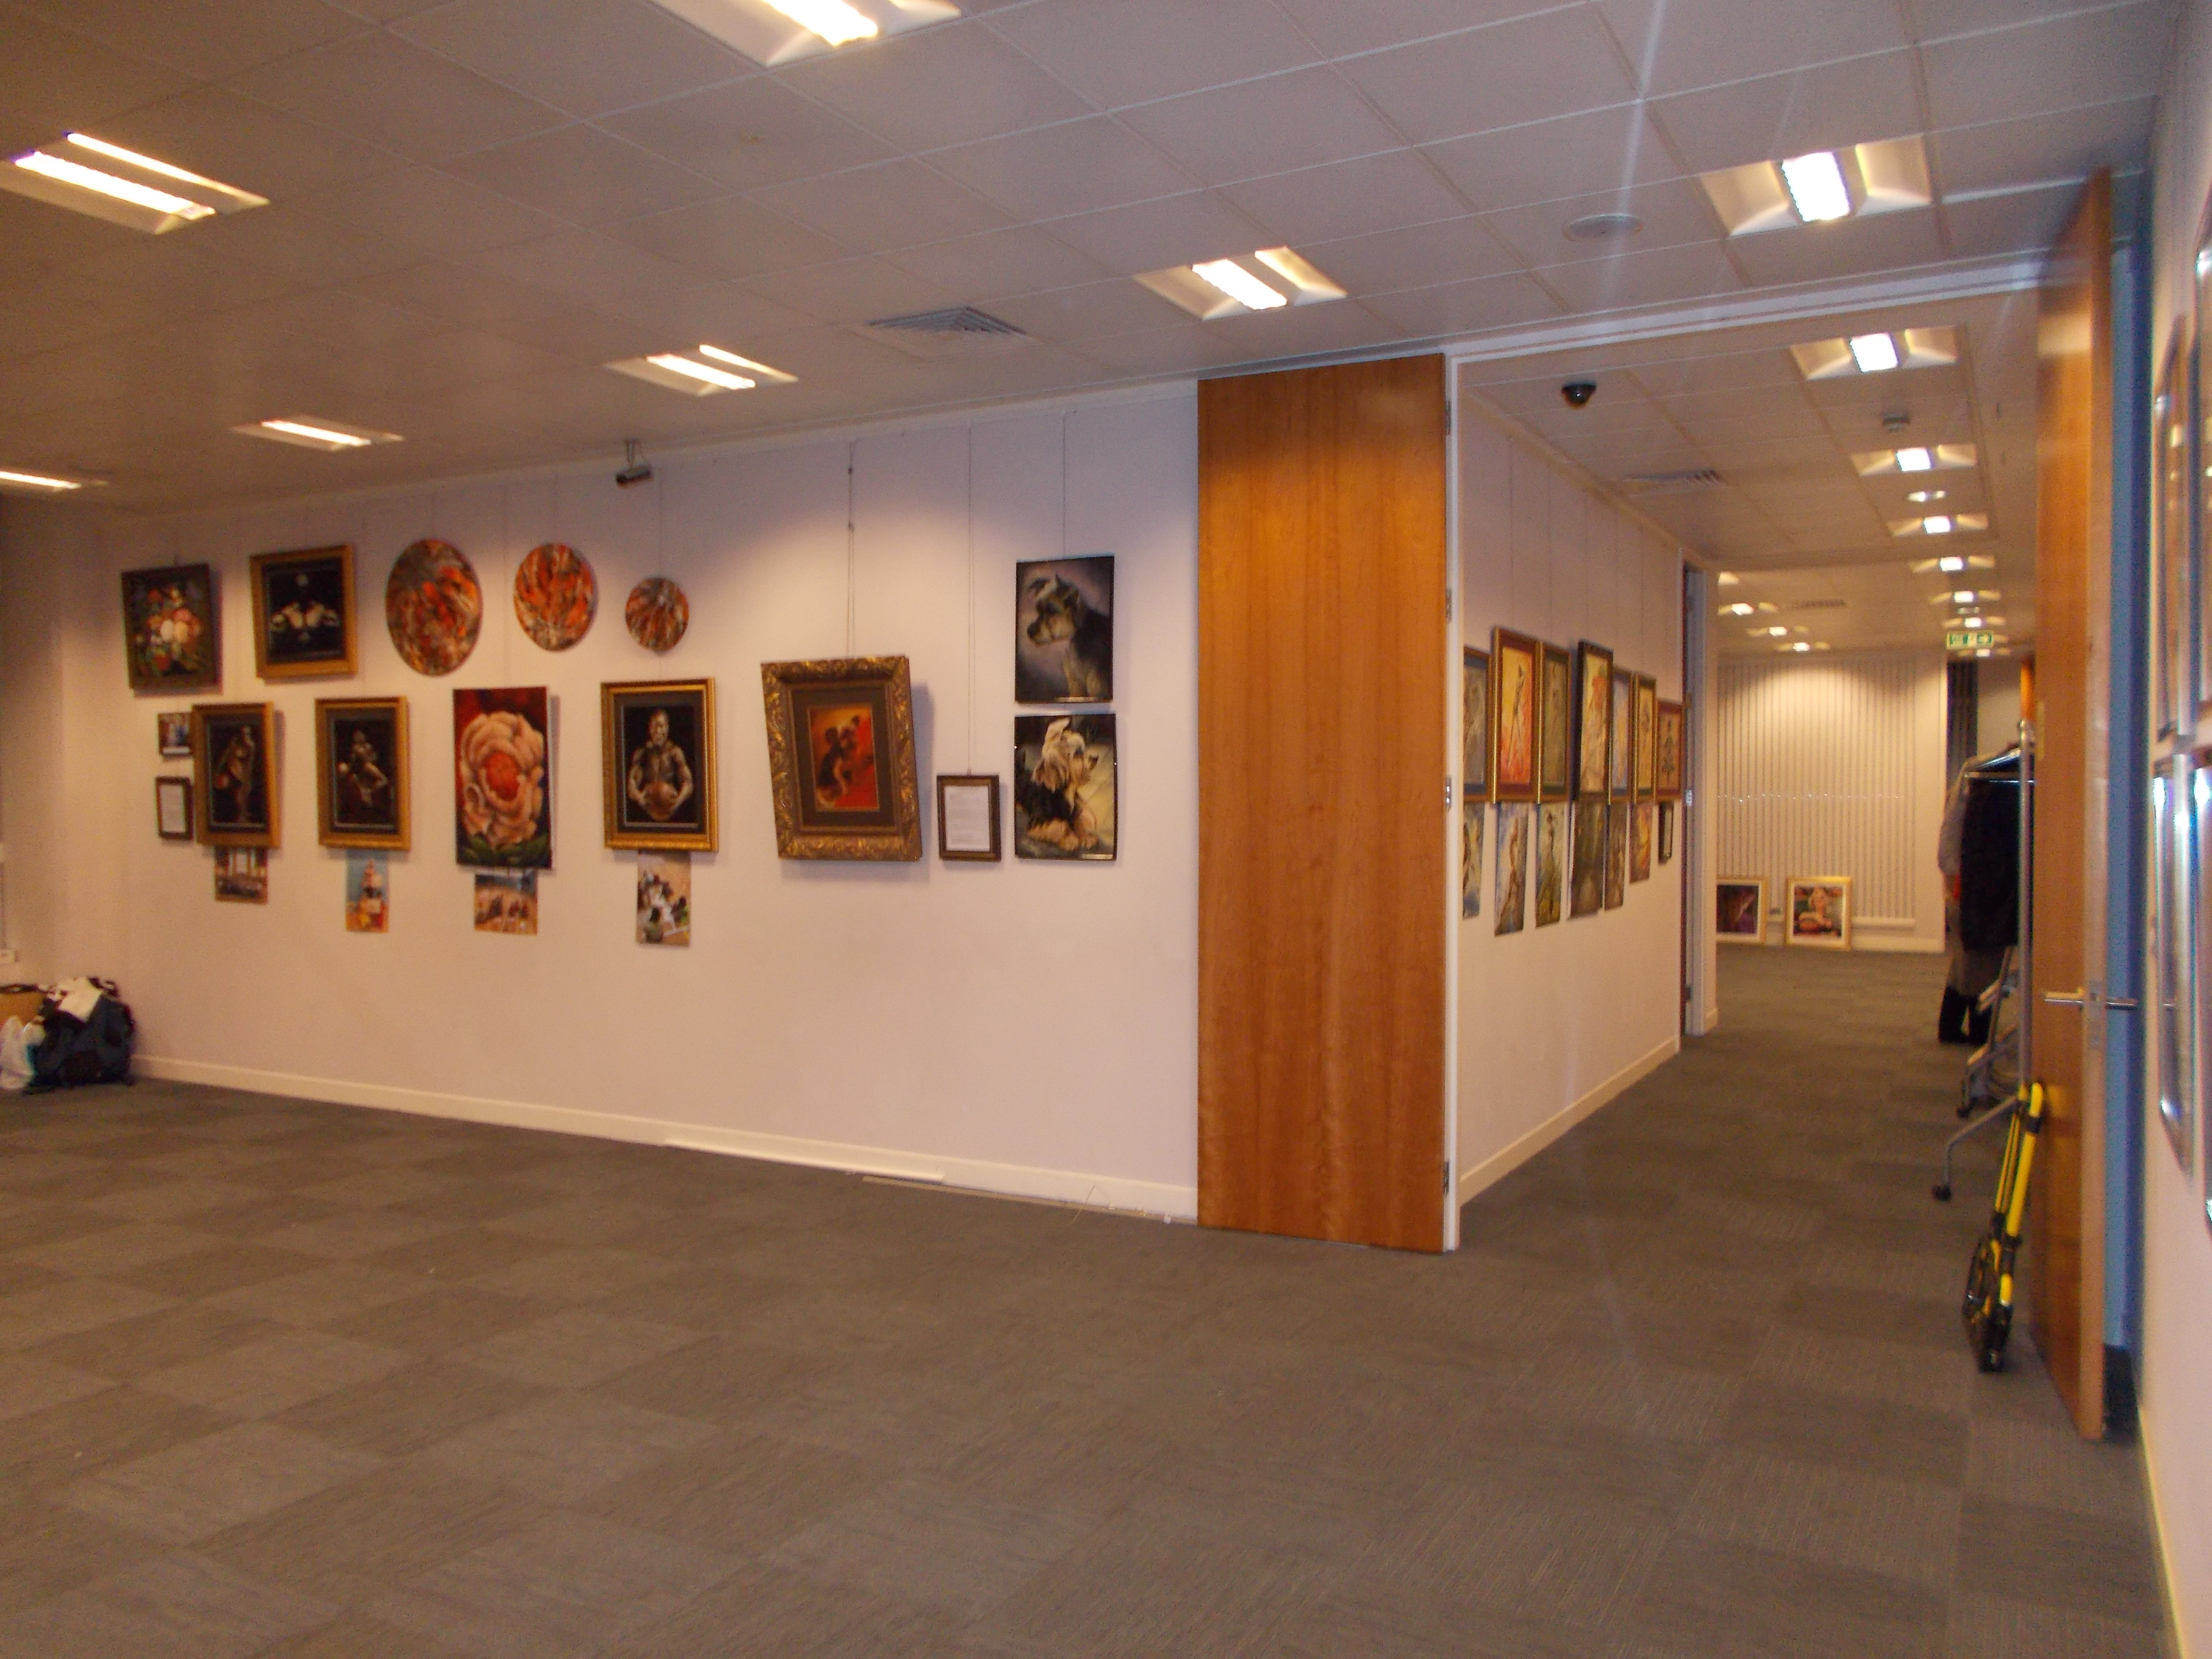 2 jurita-art and basketball- exhibition 12-22 november 2019 in Rossotrudnichestvo London (1)